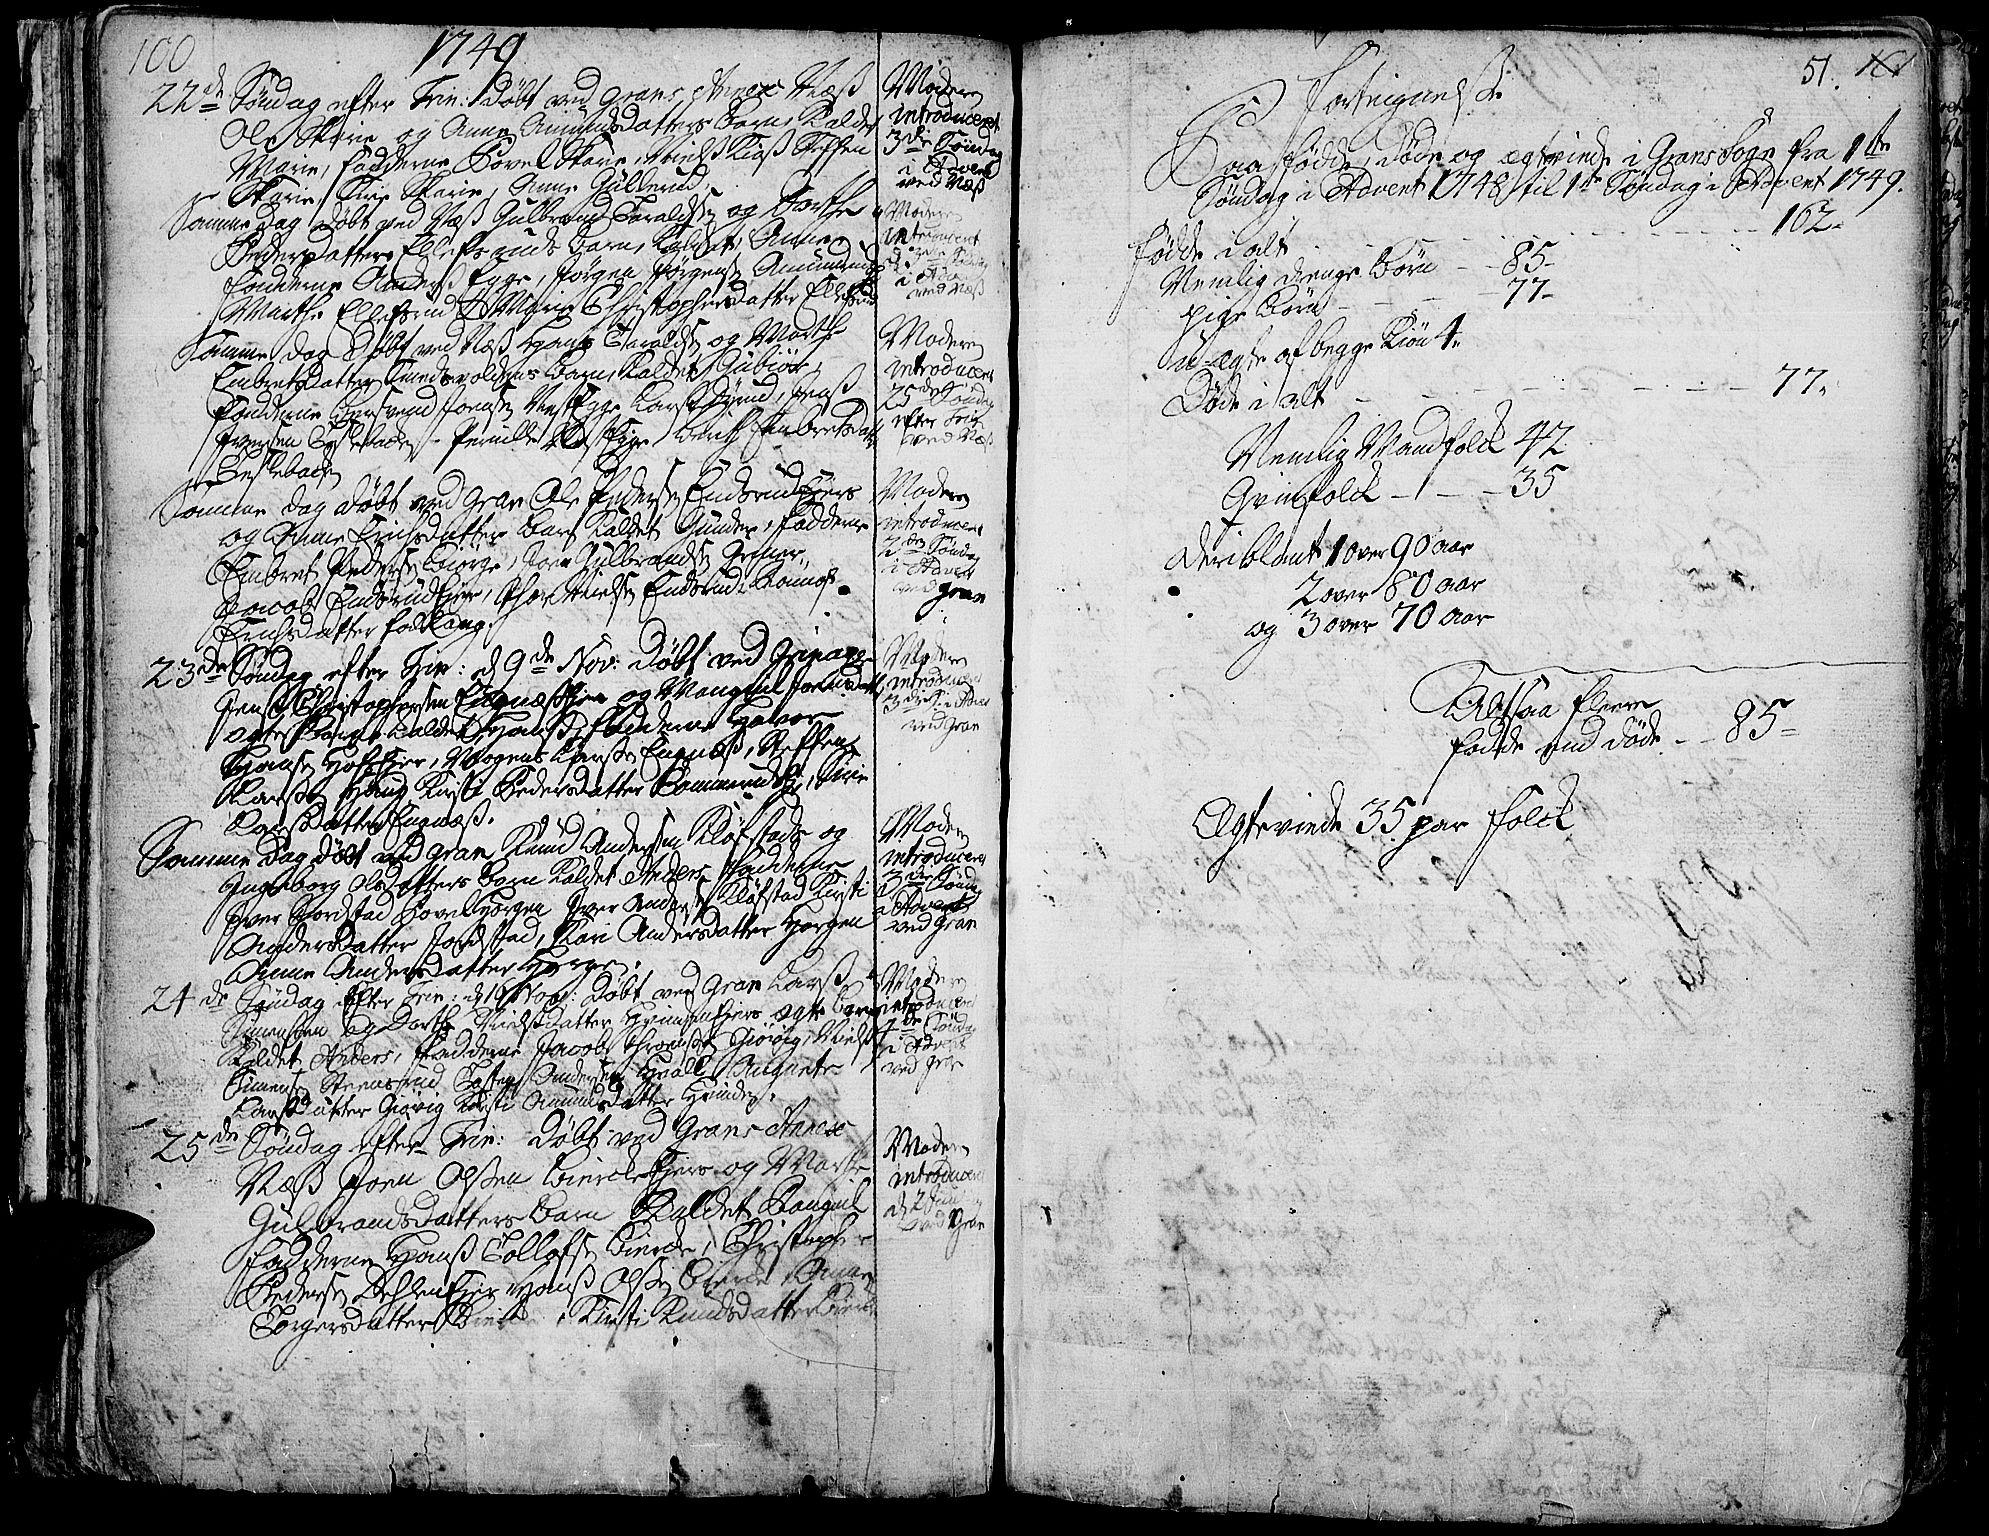 SAH, Gran prestekontor, Ministerialbok nr. 3, 1745-1758, s. 51